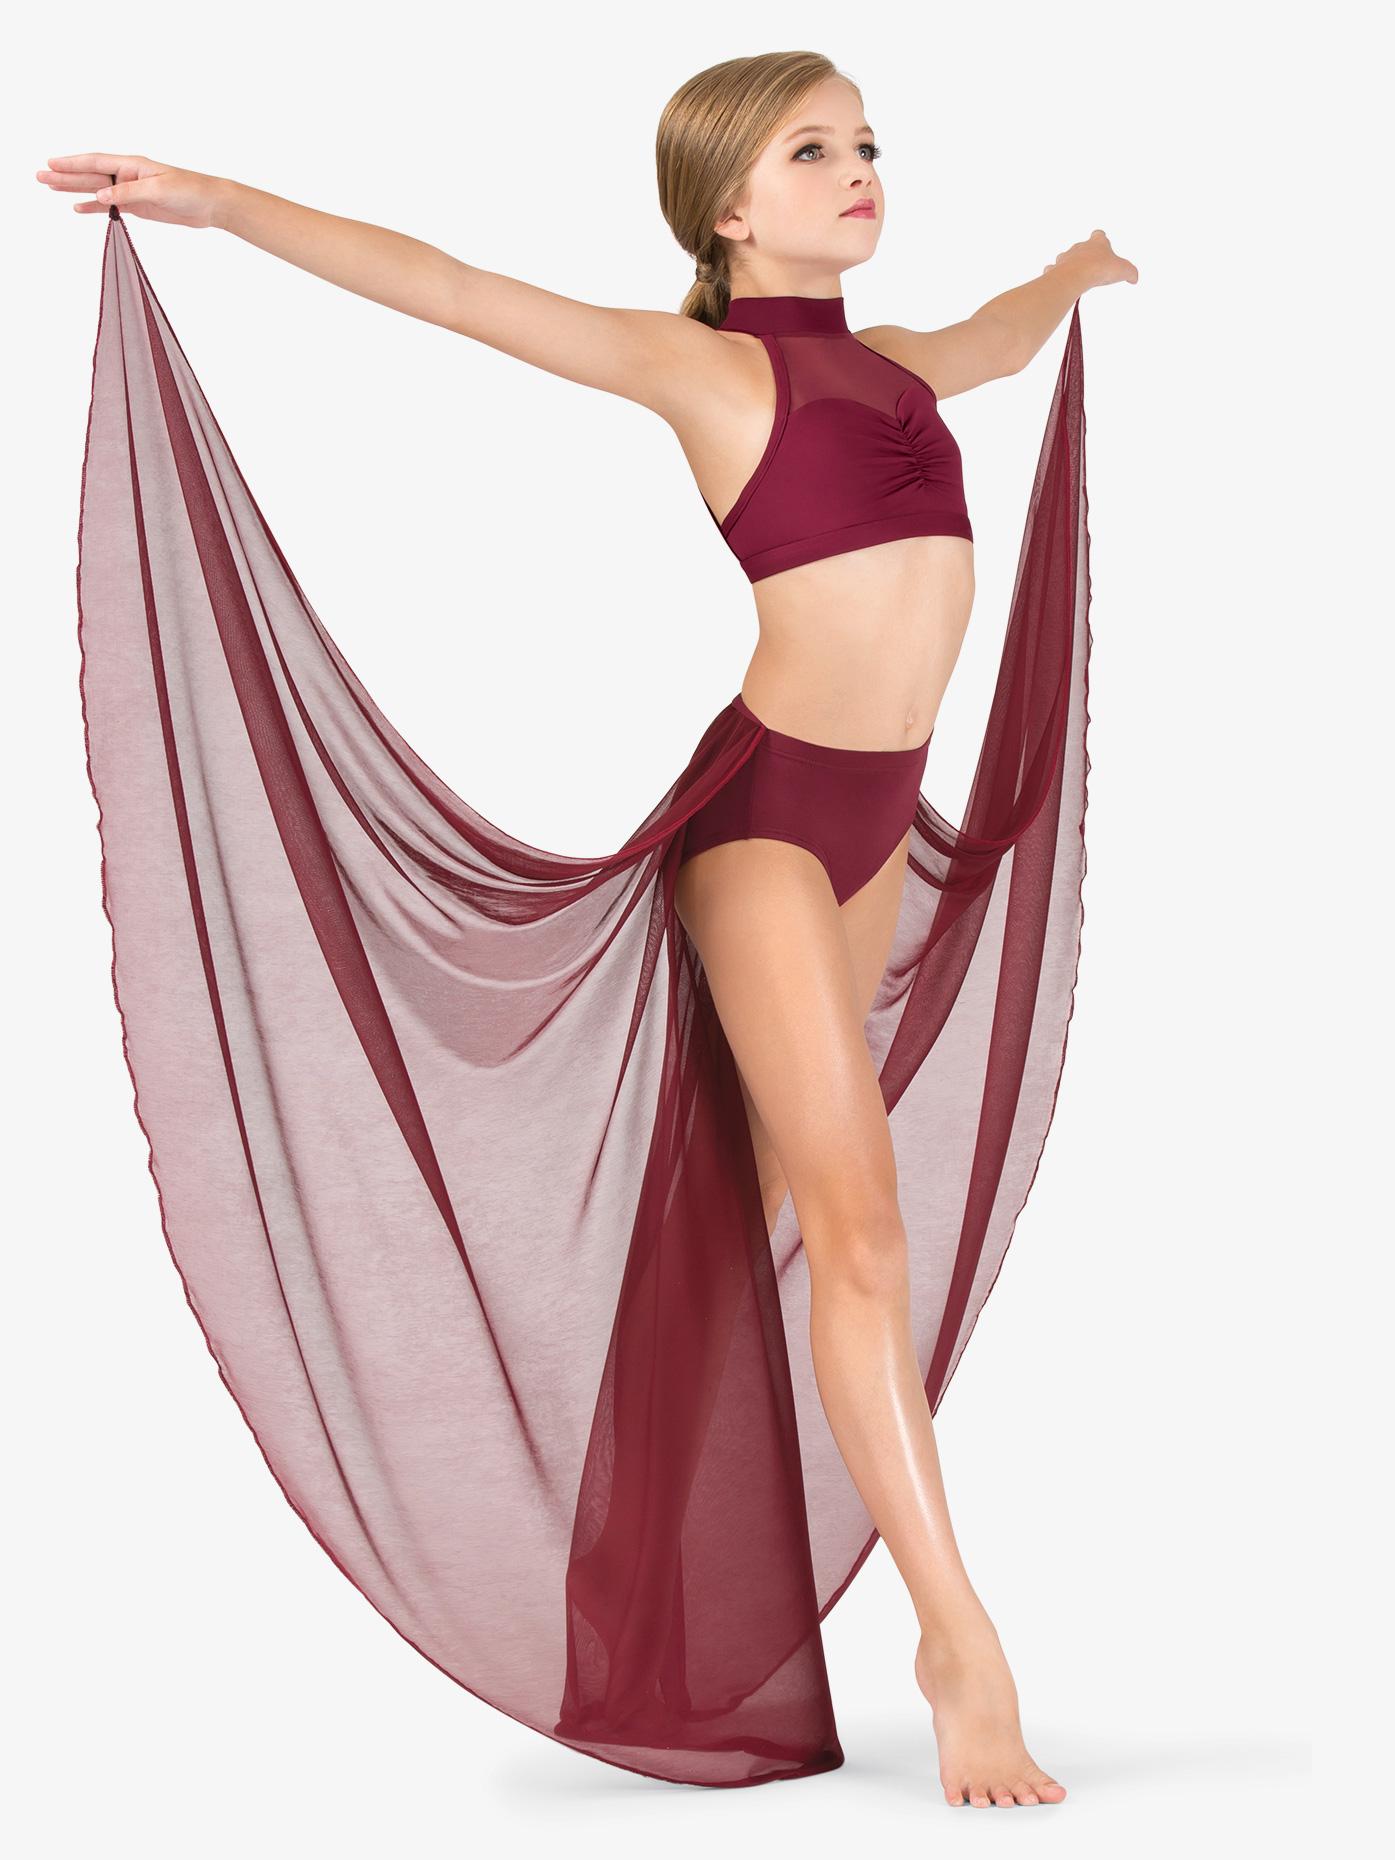 Body Wrappers Girls Performance Long Half Skirt BW1116